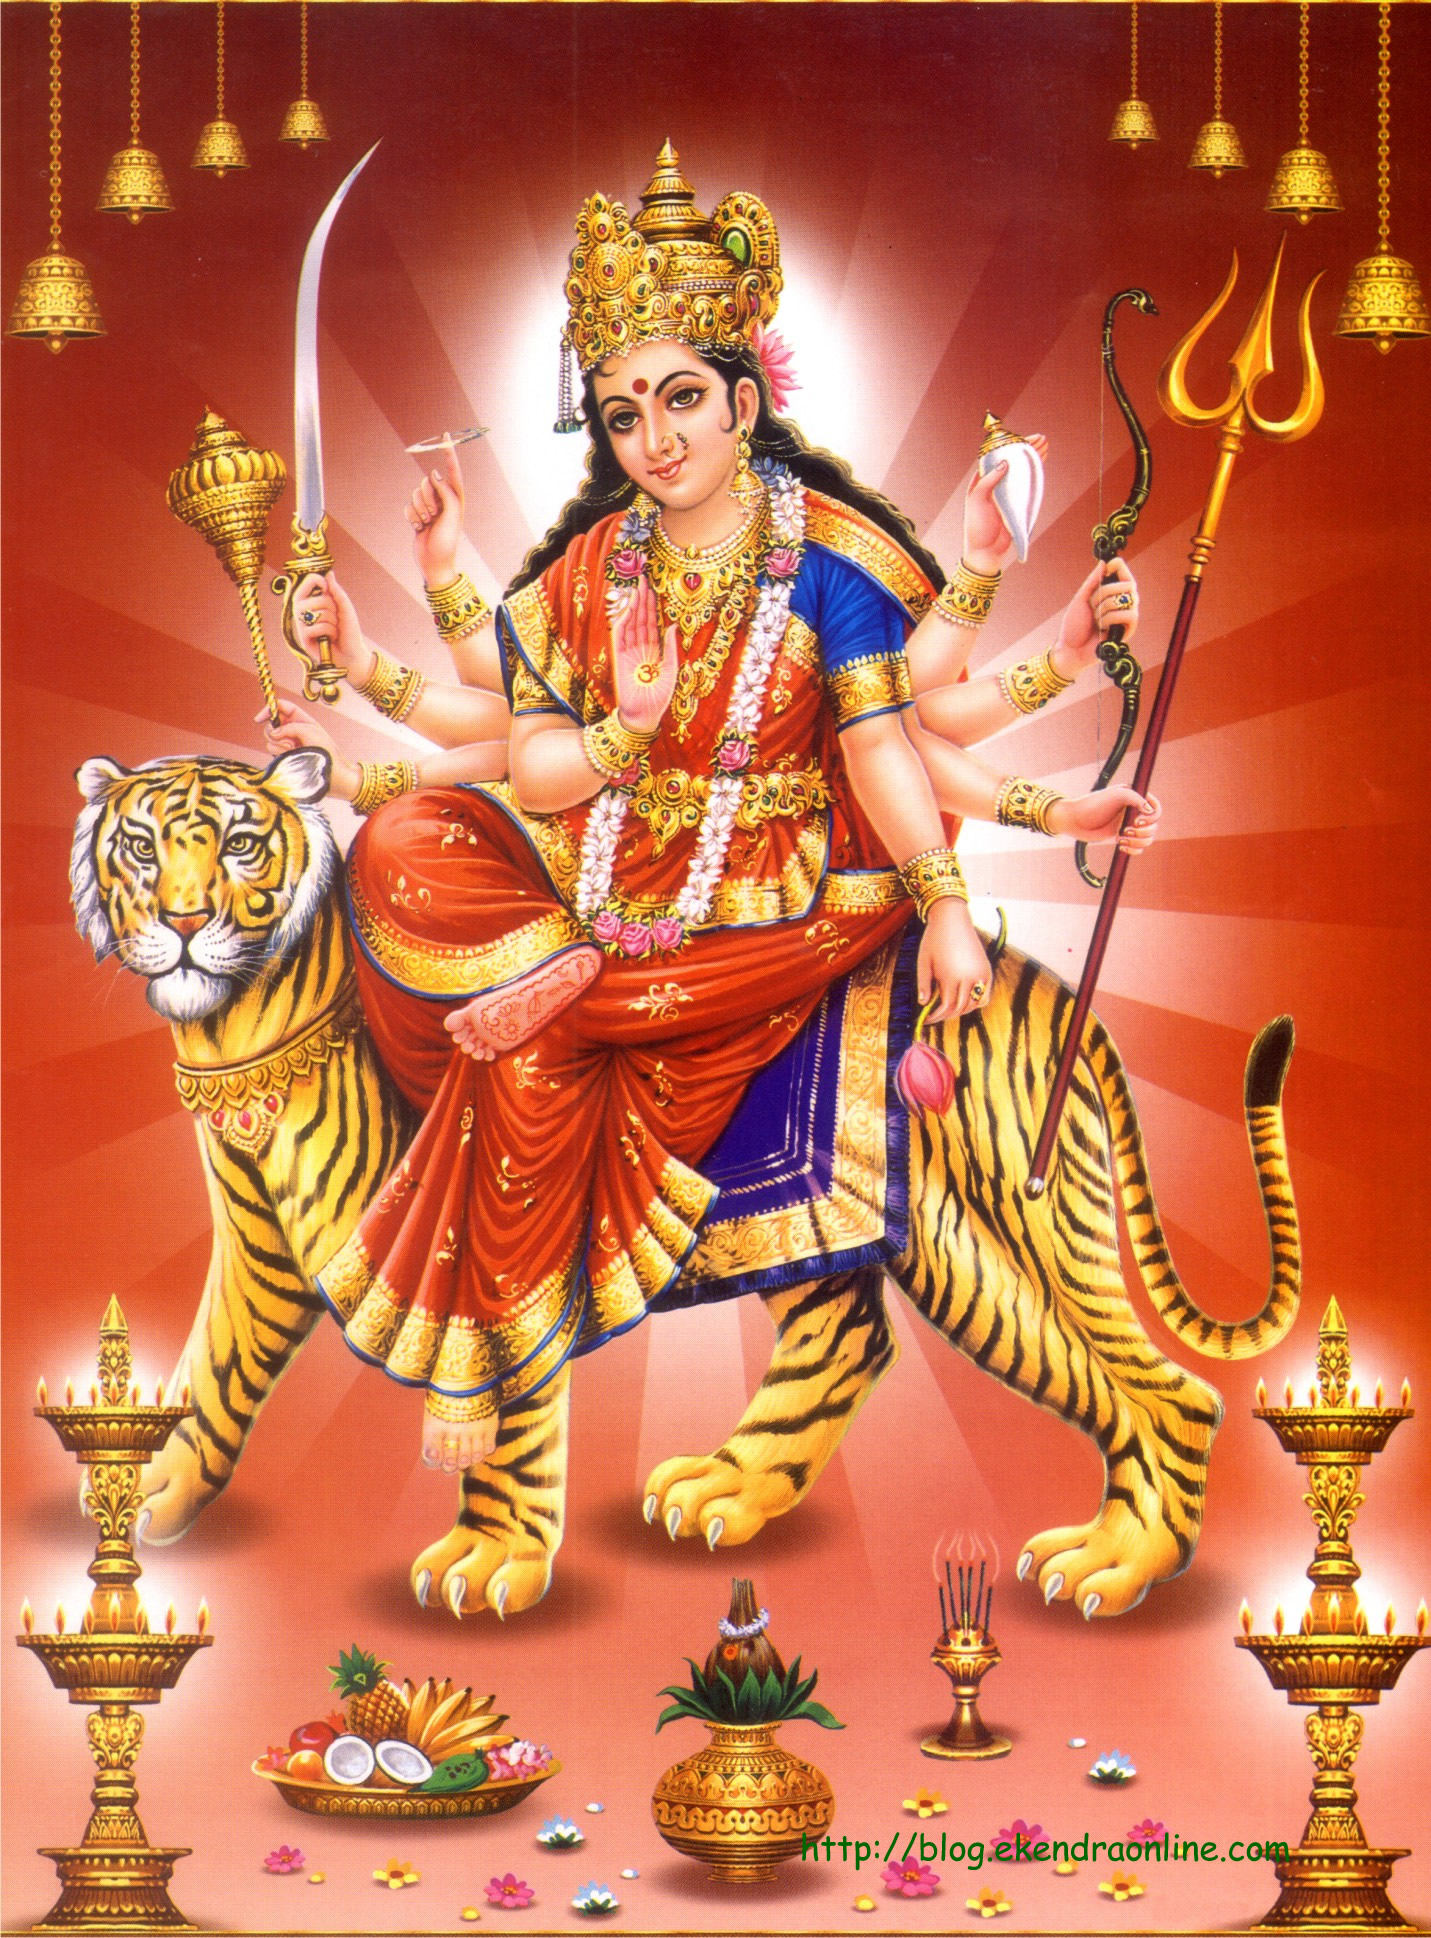 Praying Durga mata on Dashain/ Nava ratri